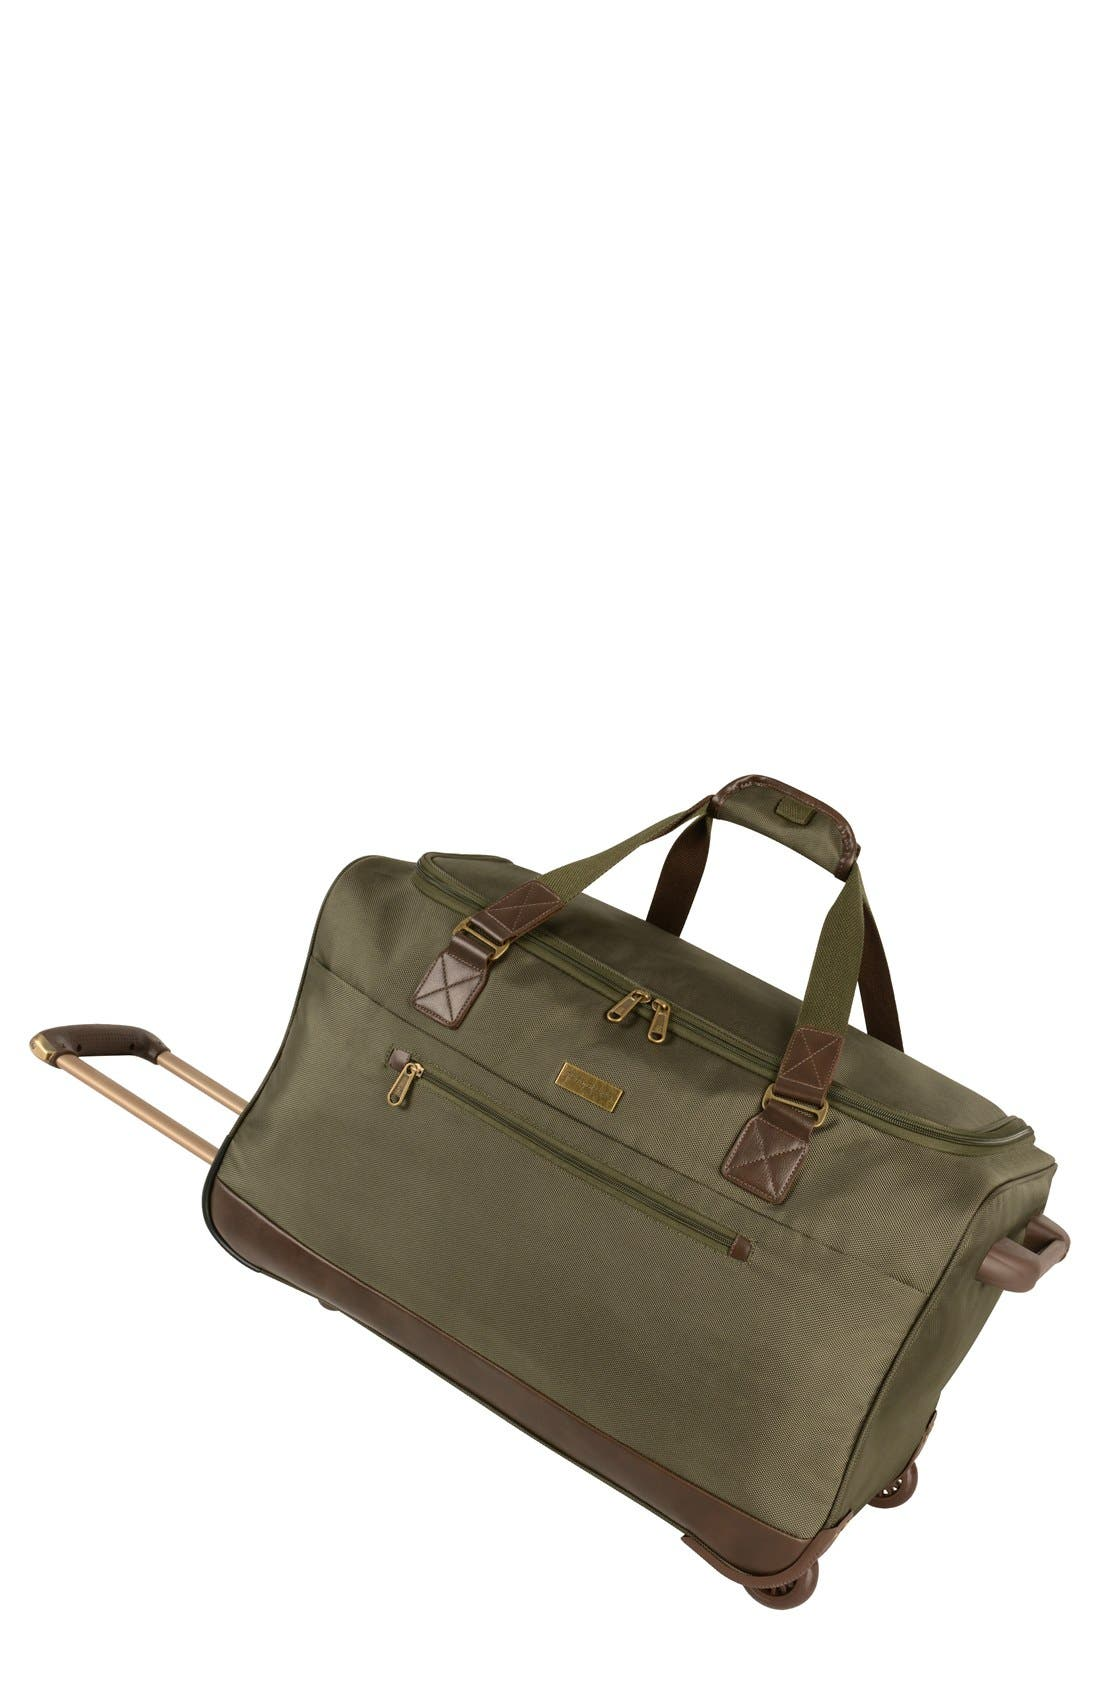 Alternate Image 1 Selected - Tommy Bahama 'Surge' Wheeled Duffel Bag (27 Inch)